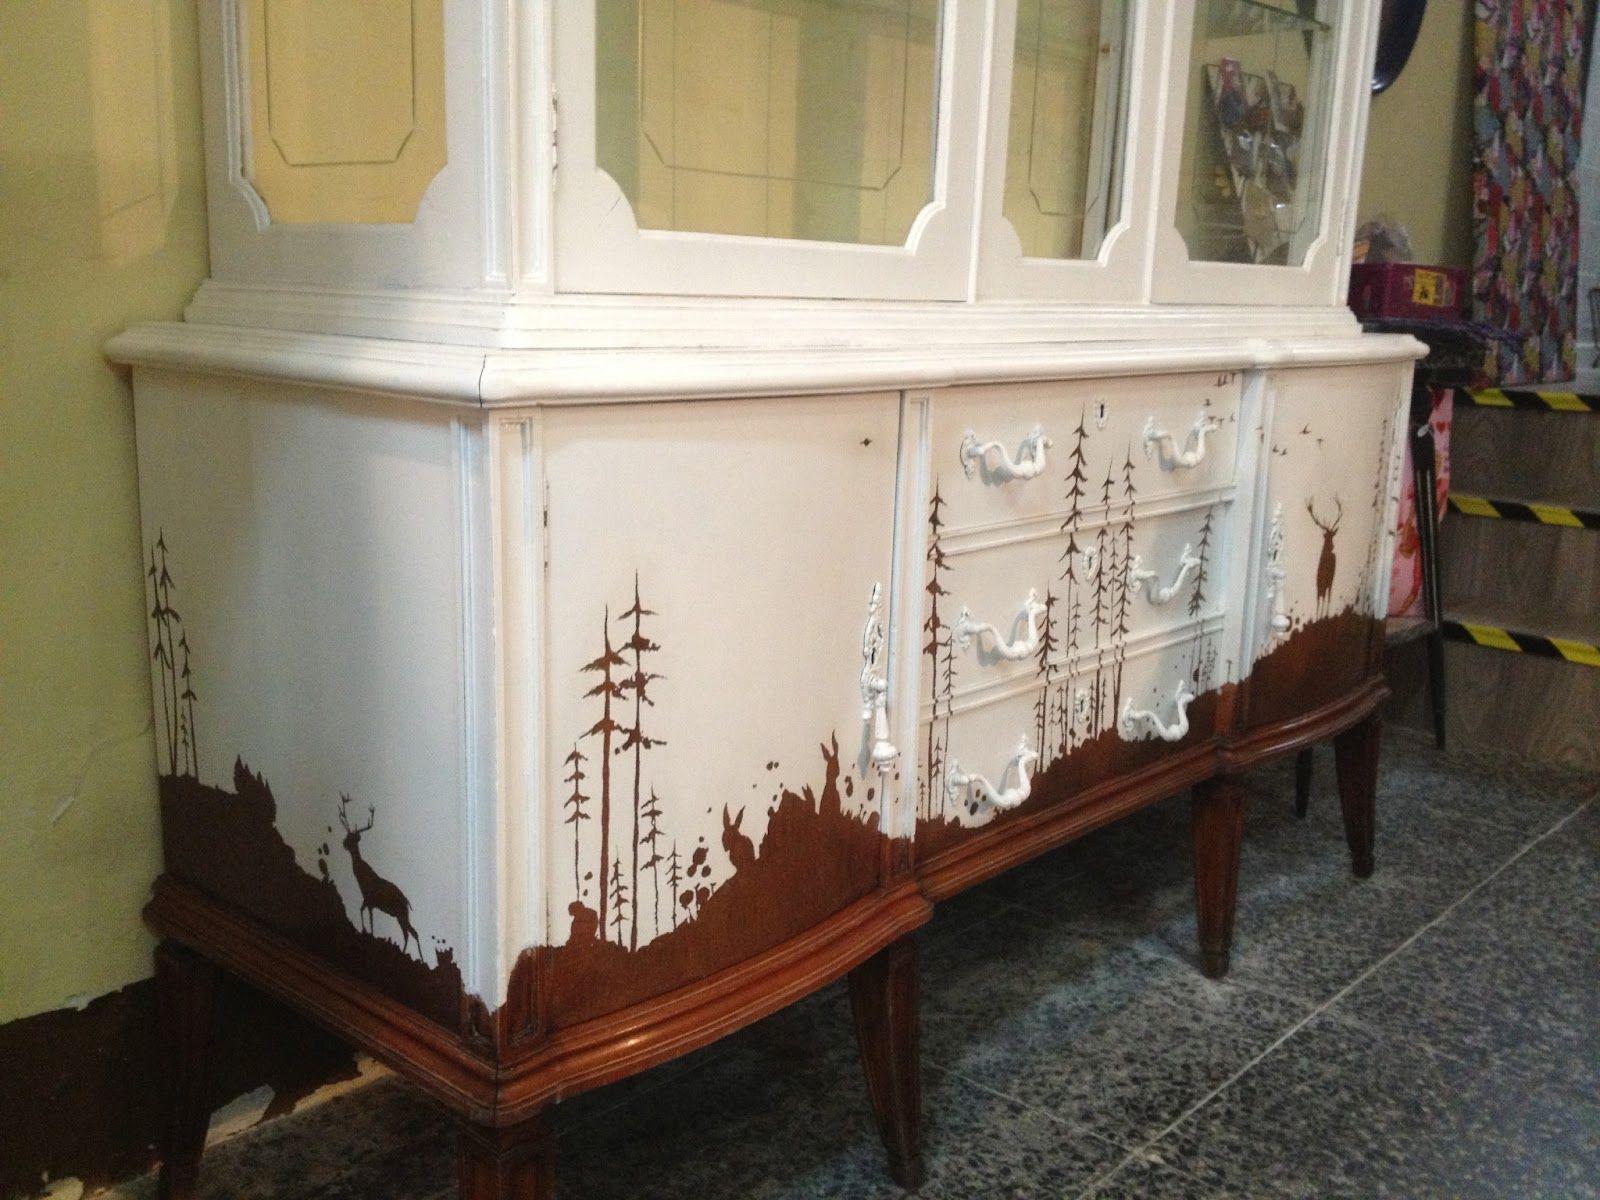 Muebles Restaurados - Patina Blanco Antiguo Buscar Con Google Madera Cosas [mjhdah]http://www.malanasworkshop.com/wp-content/uploads/2014/06/muebles-restaurados-1170×691.jpg